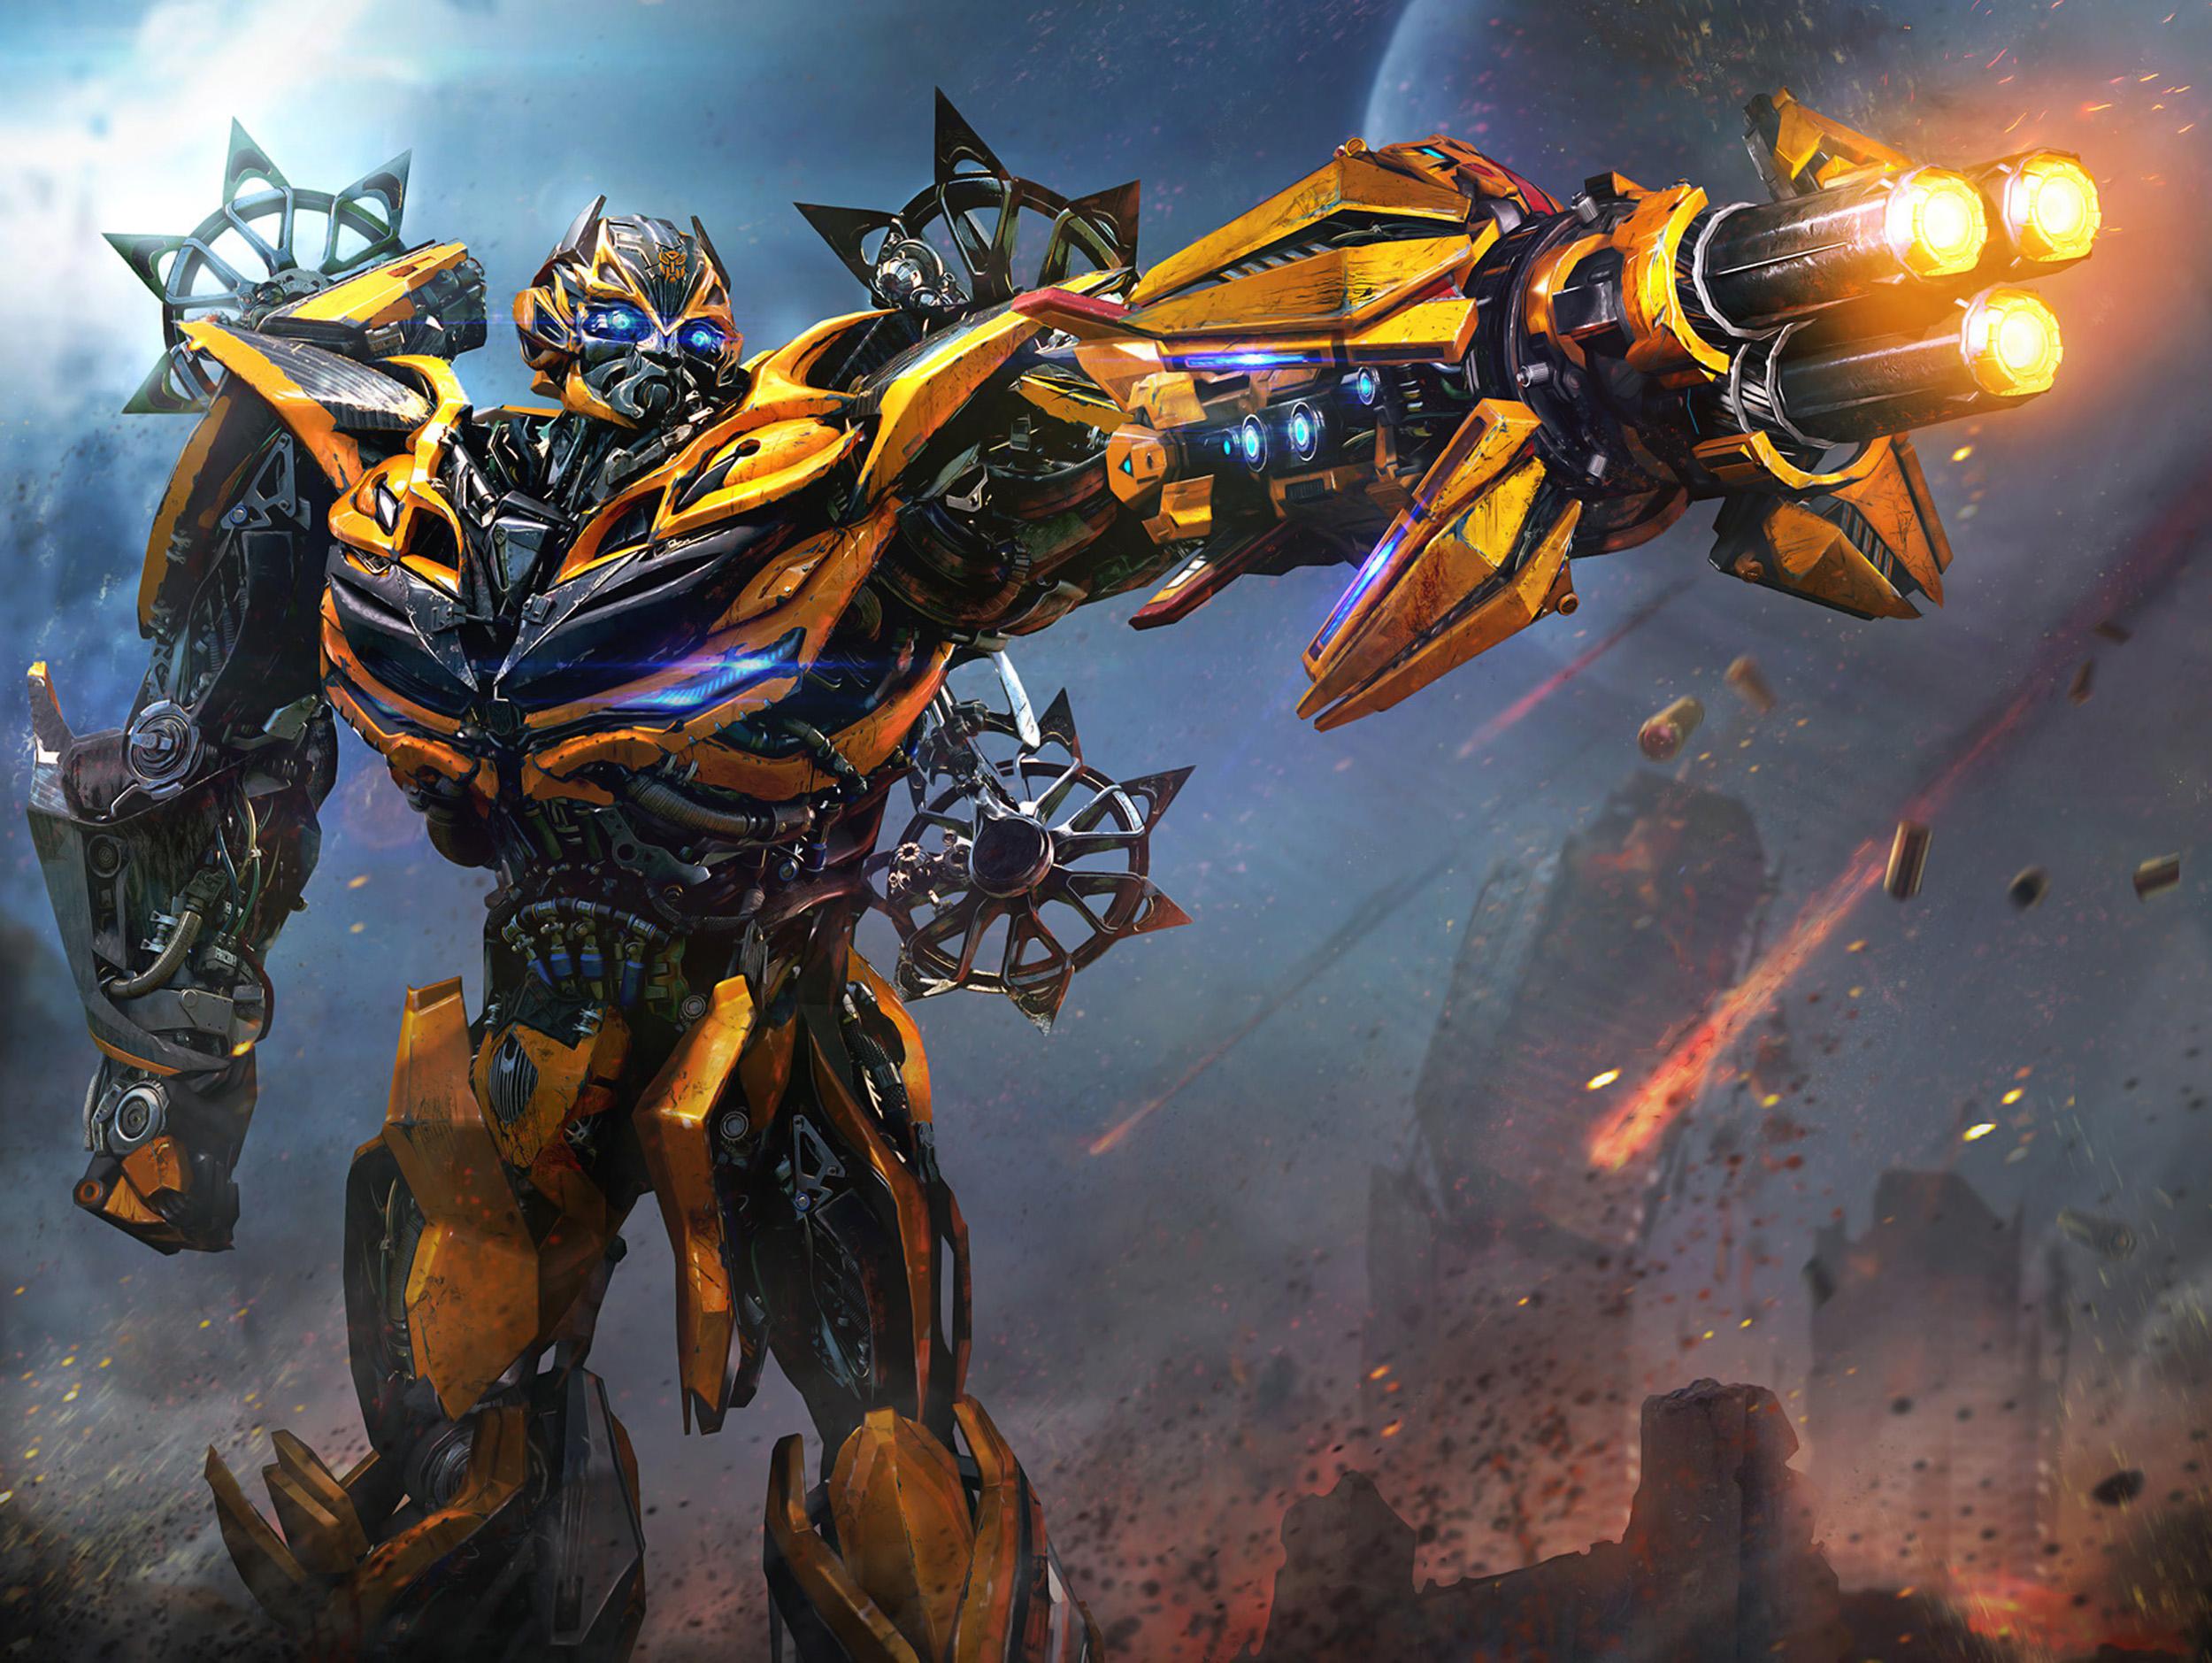 Bumblebee (Transformers) HD Wallpaper